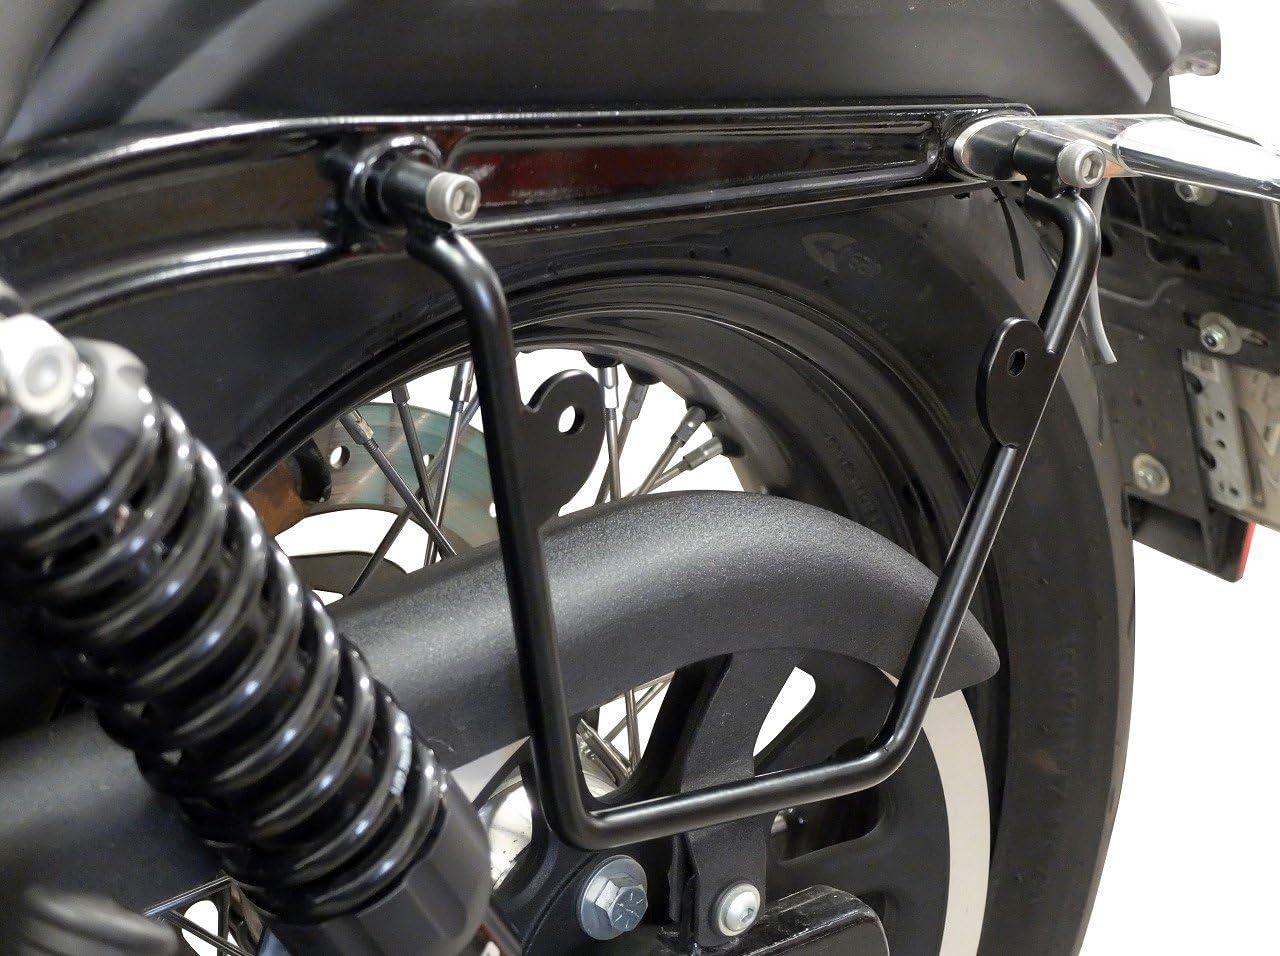 BUFFALO BAG Satteltaschenhalter links und rechts passend kompatibel mit Harley-Davidson Dyna Fat Bob 2008-2017